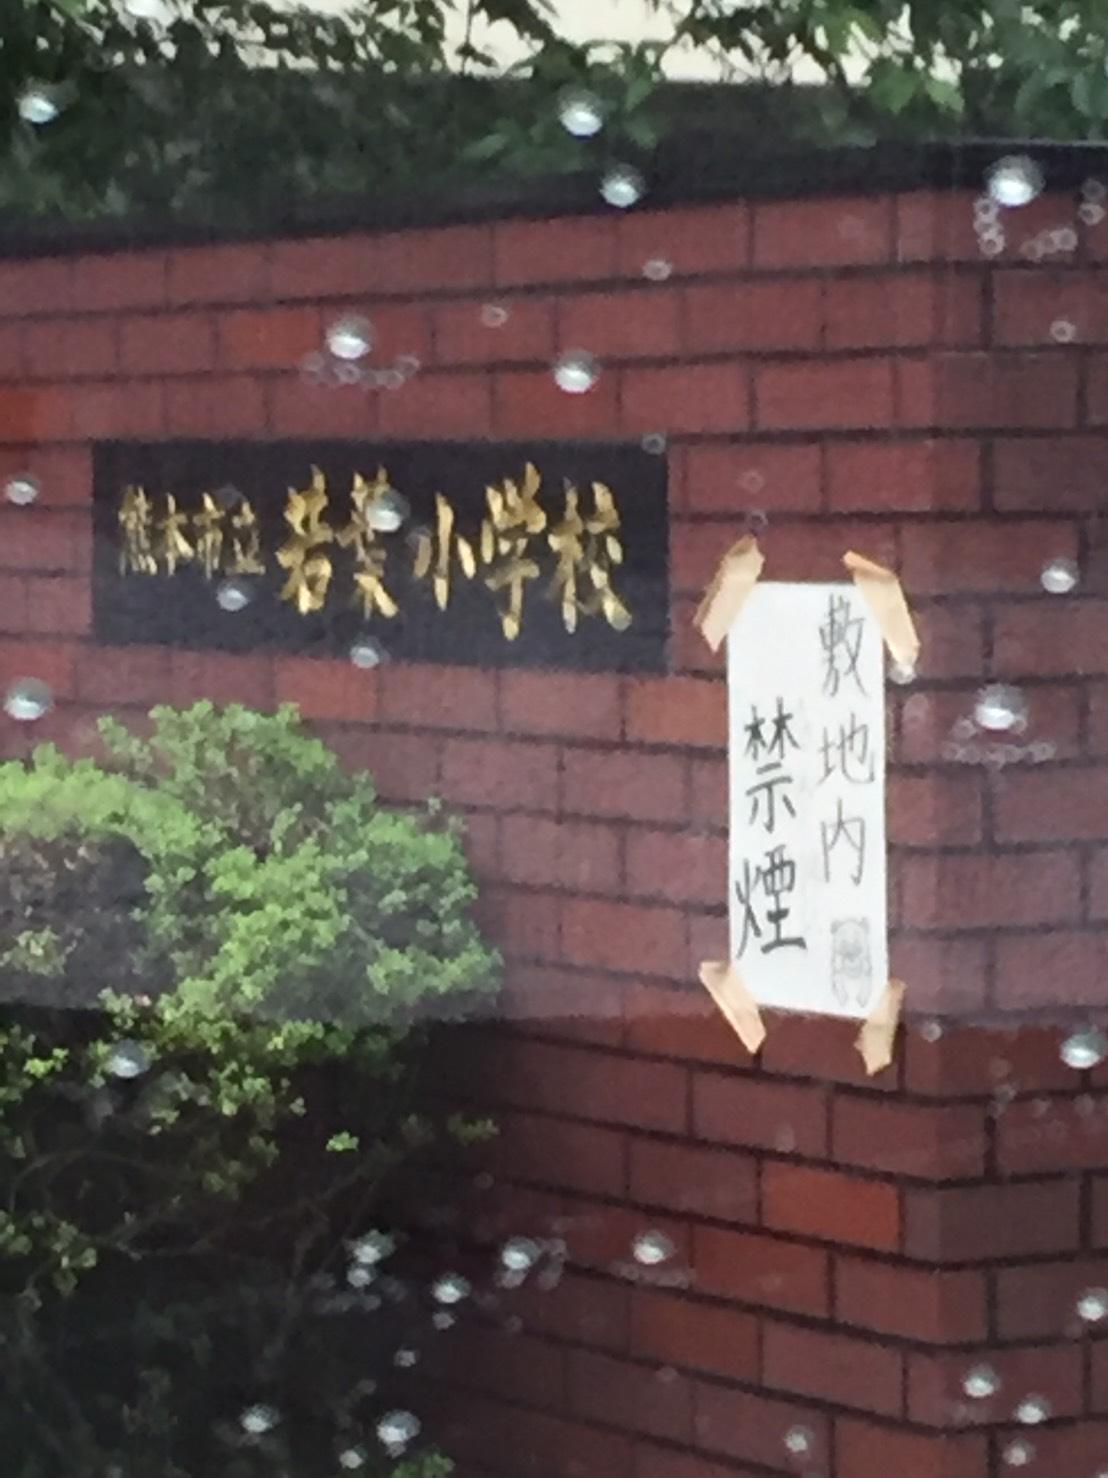 http://www.kickbackcafe.jp/support2/report/S__5202011.jpg